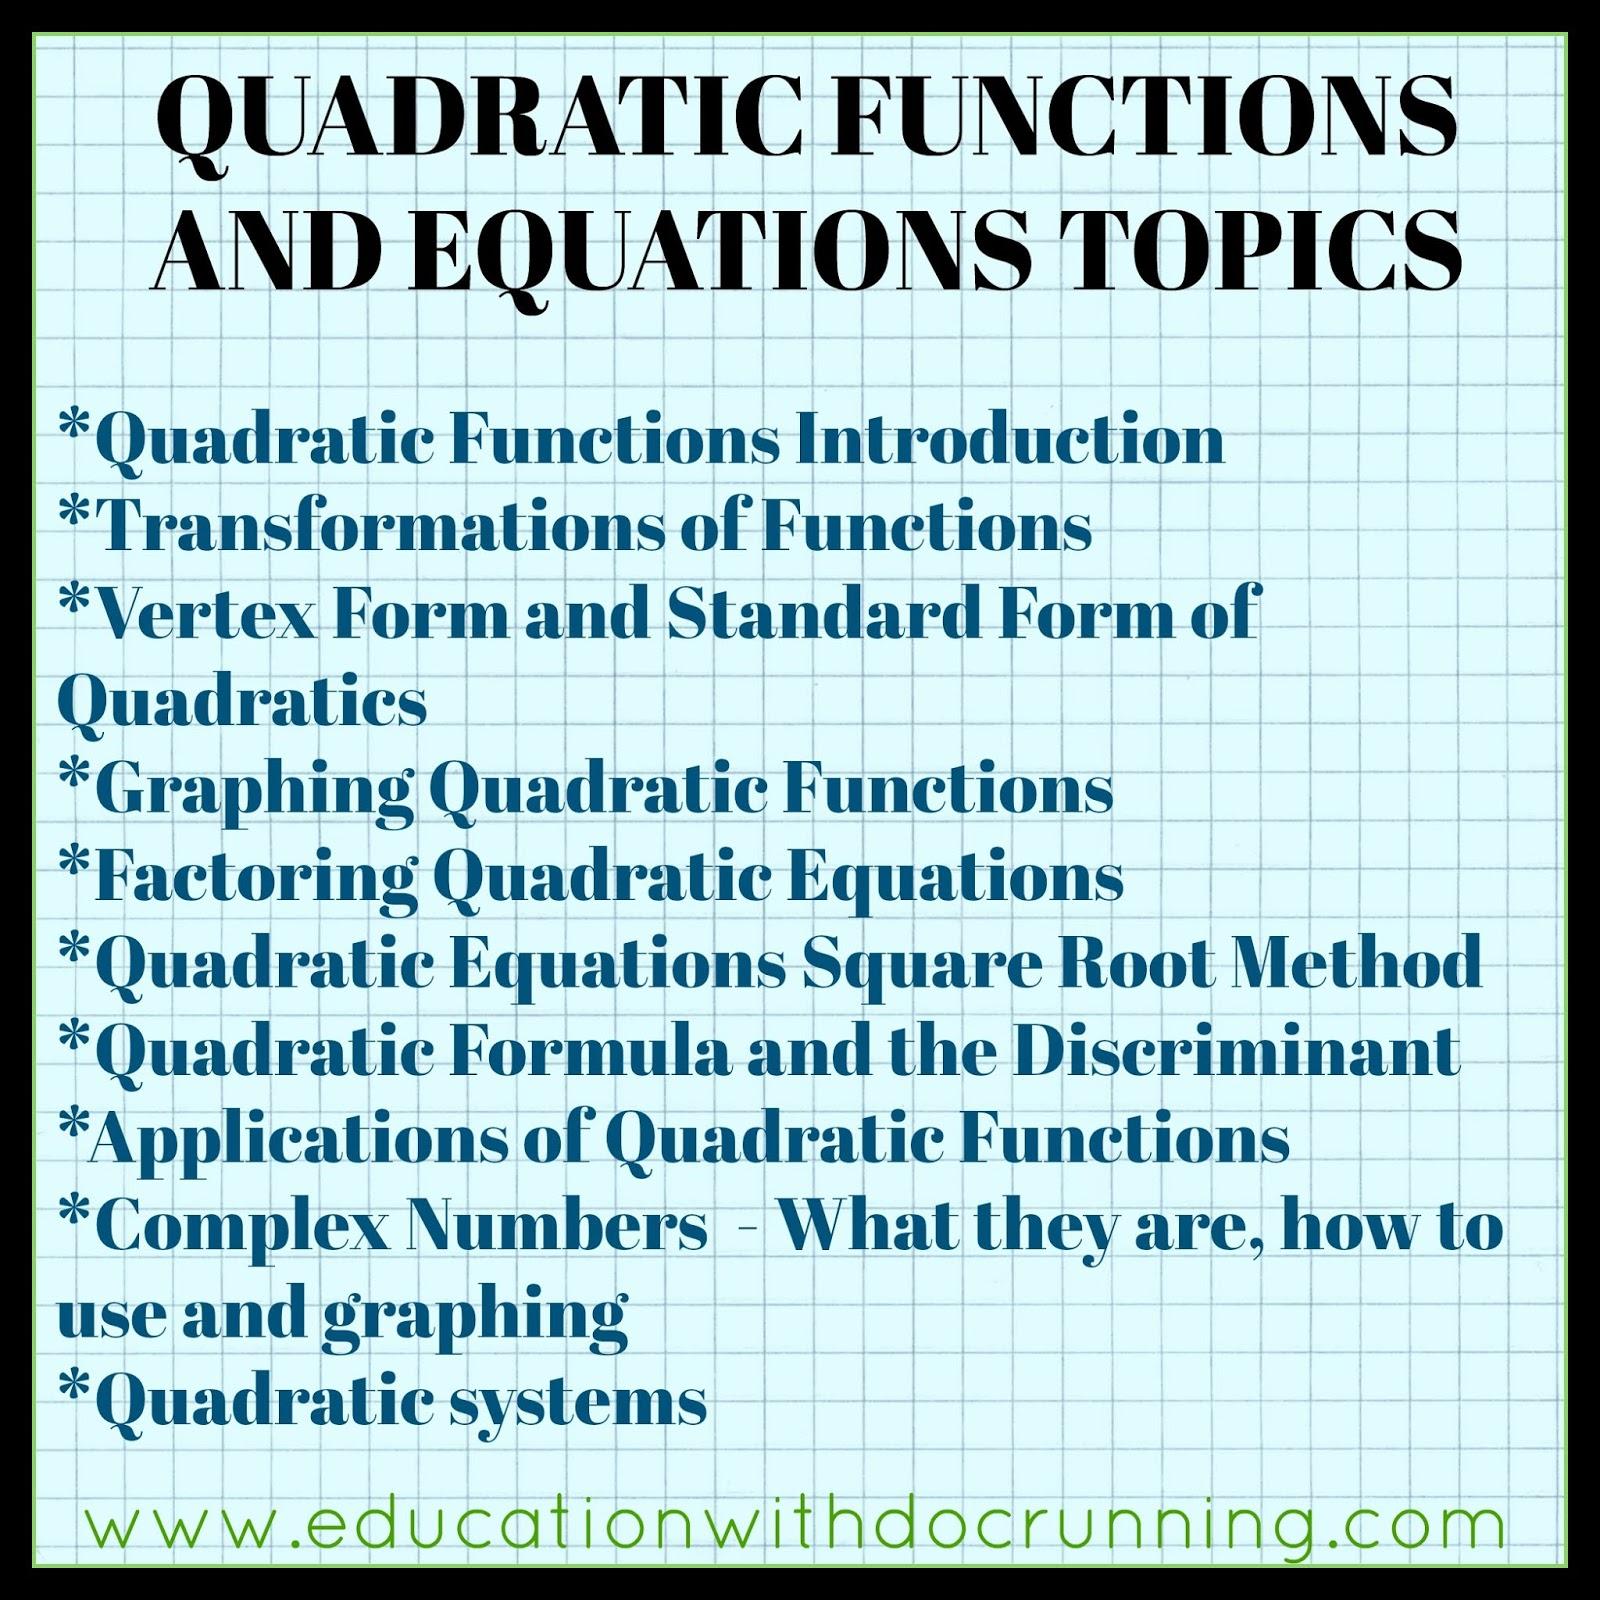 Math Mondays: Quadratics in Algebra 2 | Education with